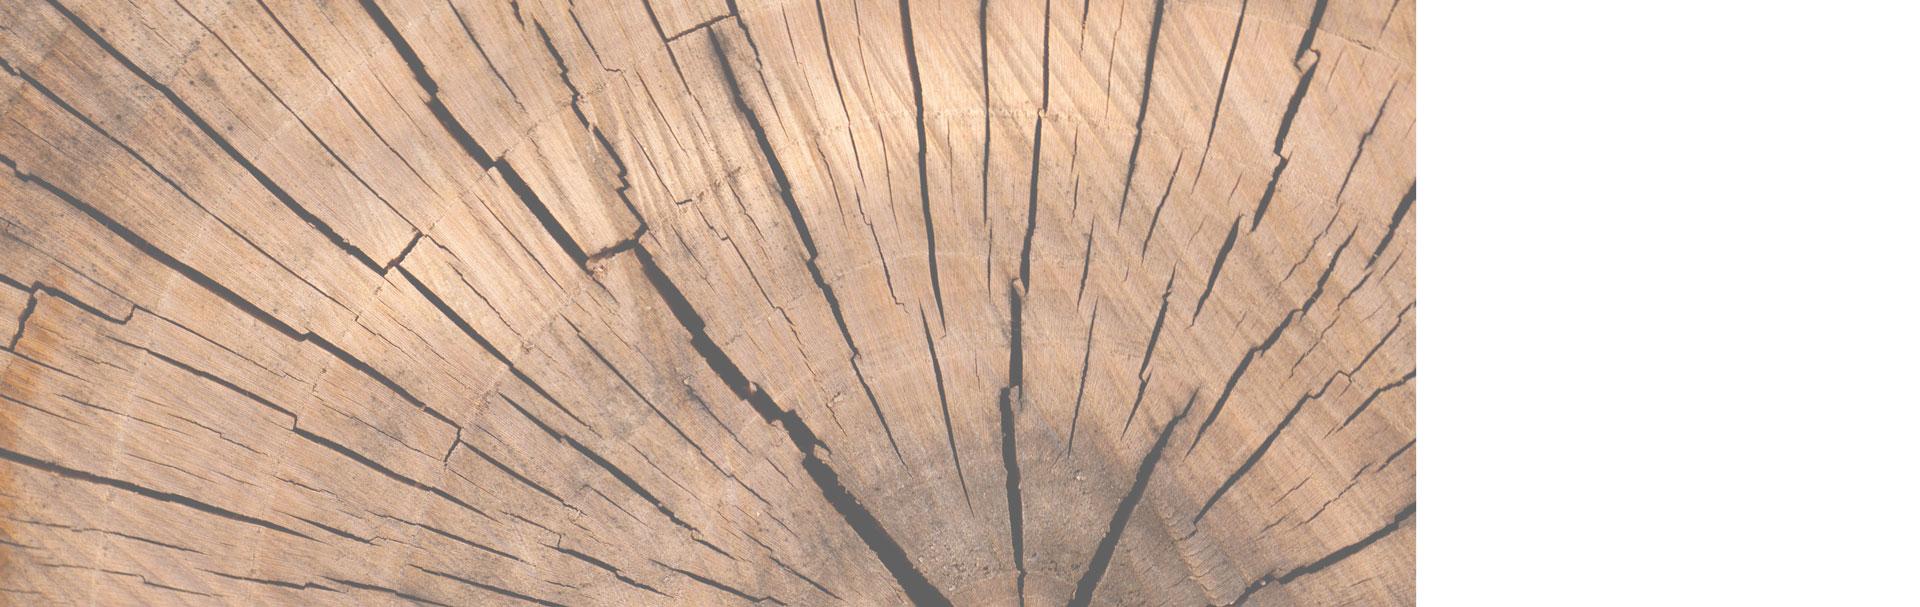 wood slider 0 - آموزش پیکر تراشی با چوب ، مجسمه سازی با چوب